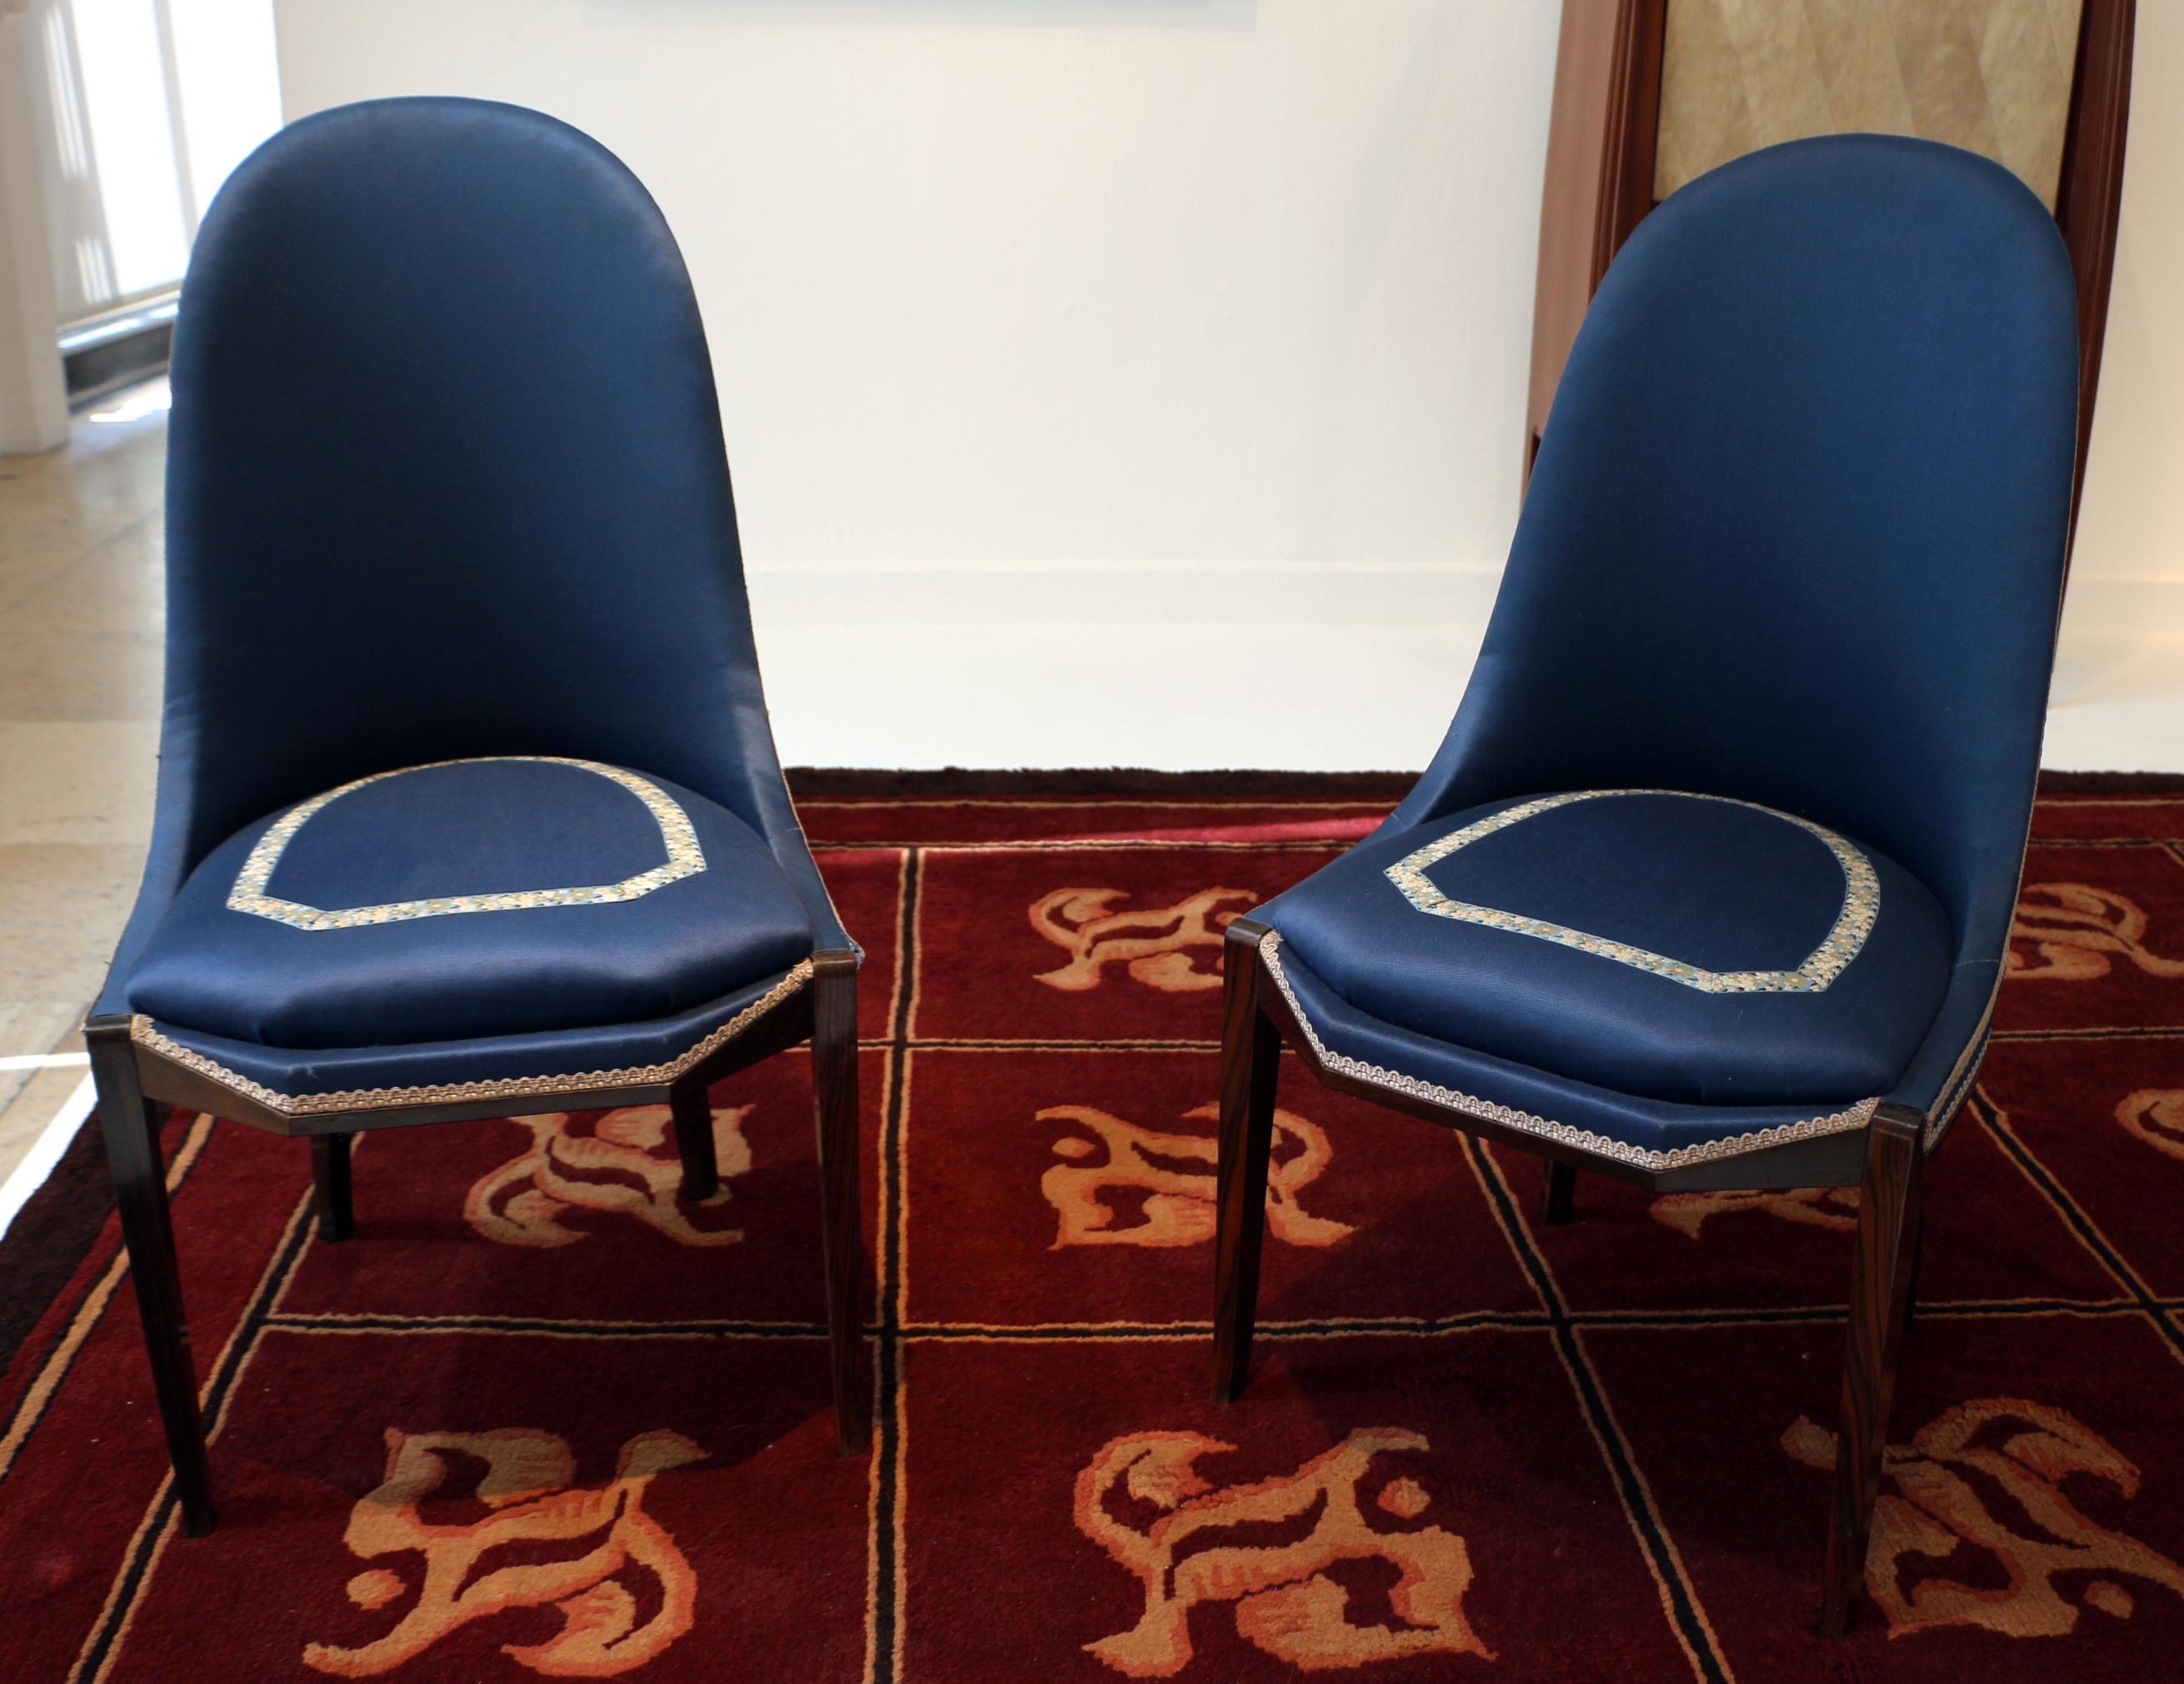 File:Jacques-emile ruhlmann, coppia di sedie, 1925 ca.jpg ...